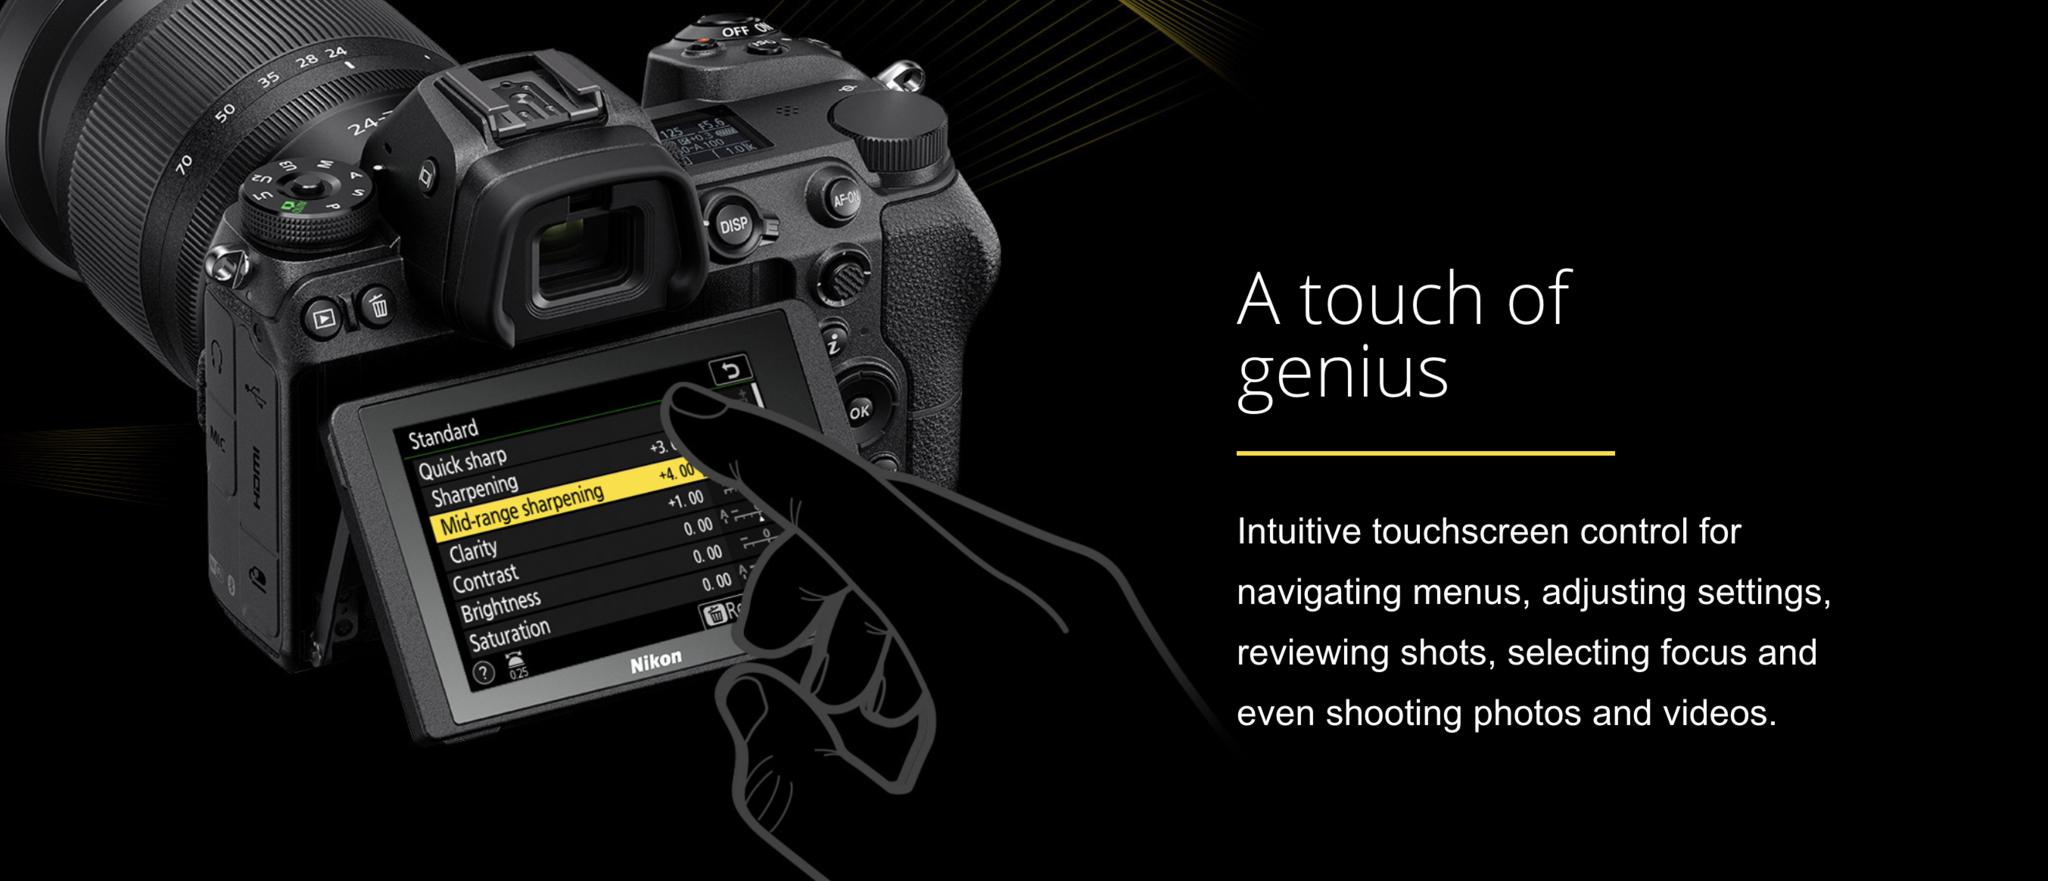 Nikon Z6 24-70mm f/4 Mirrorless Camera (Lens Kit) #1598